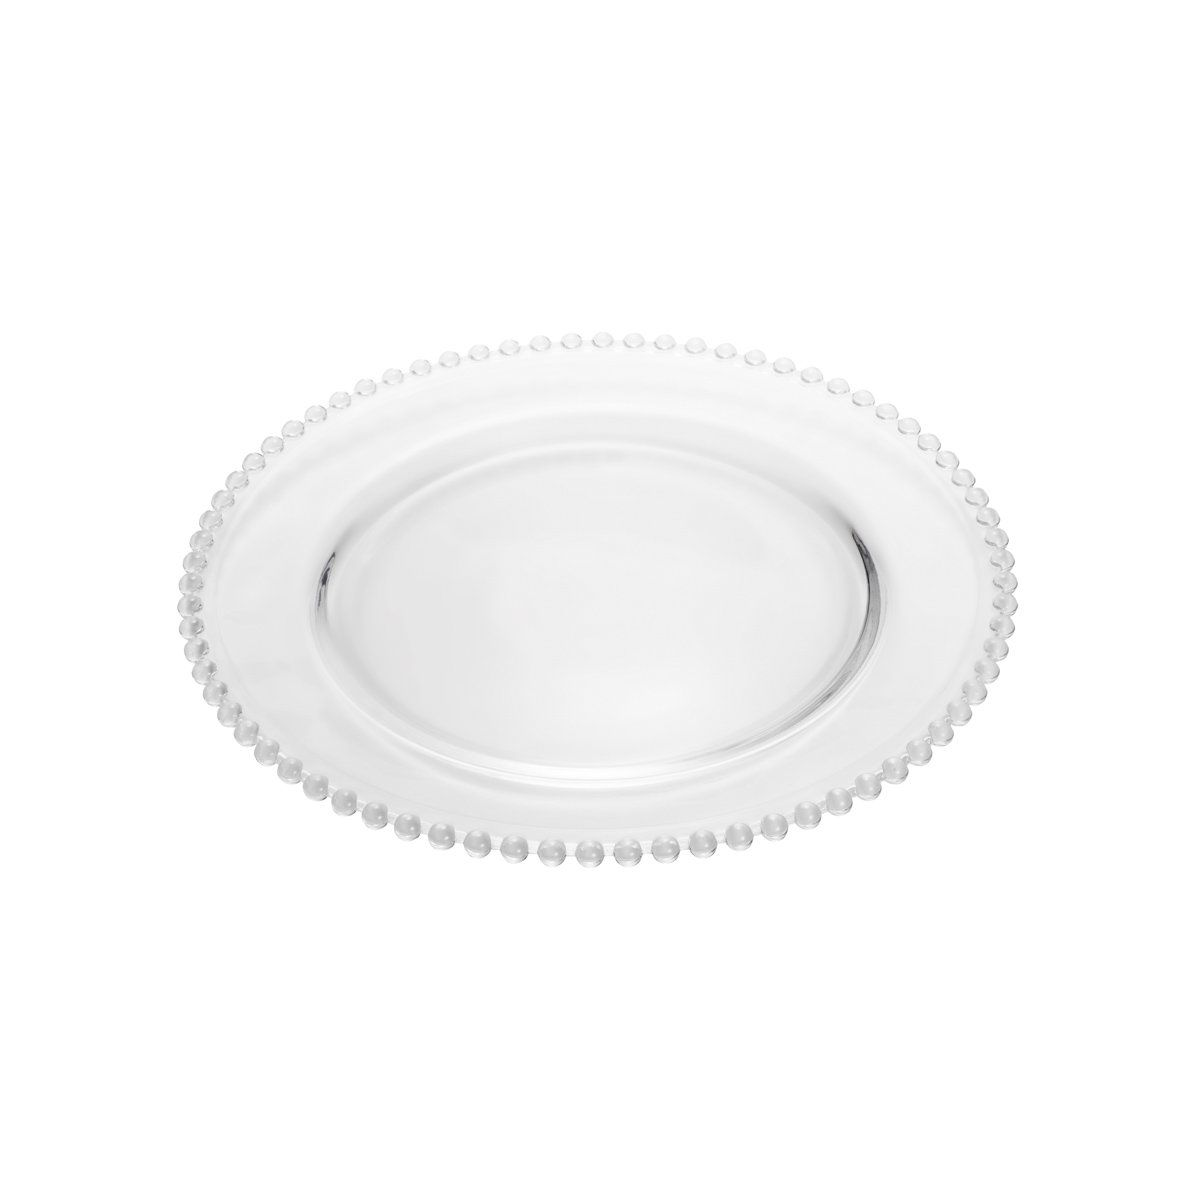 Prato 27 cm de cristal transparente Pearl Wolff - 2671